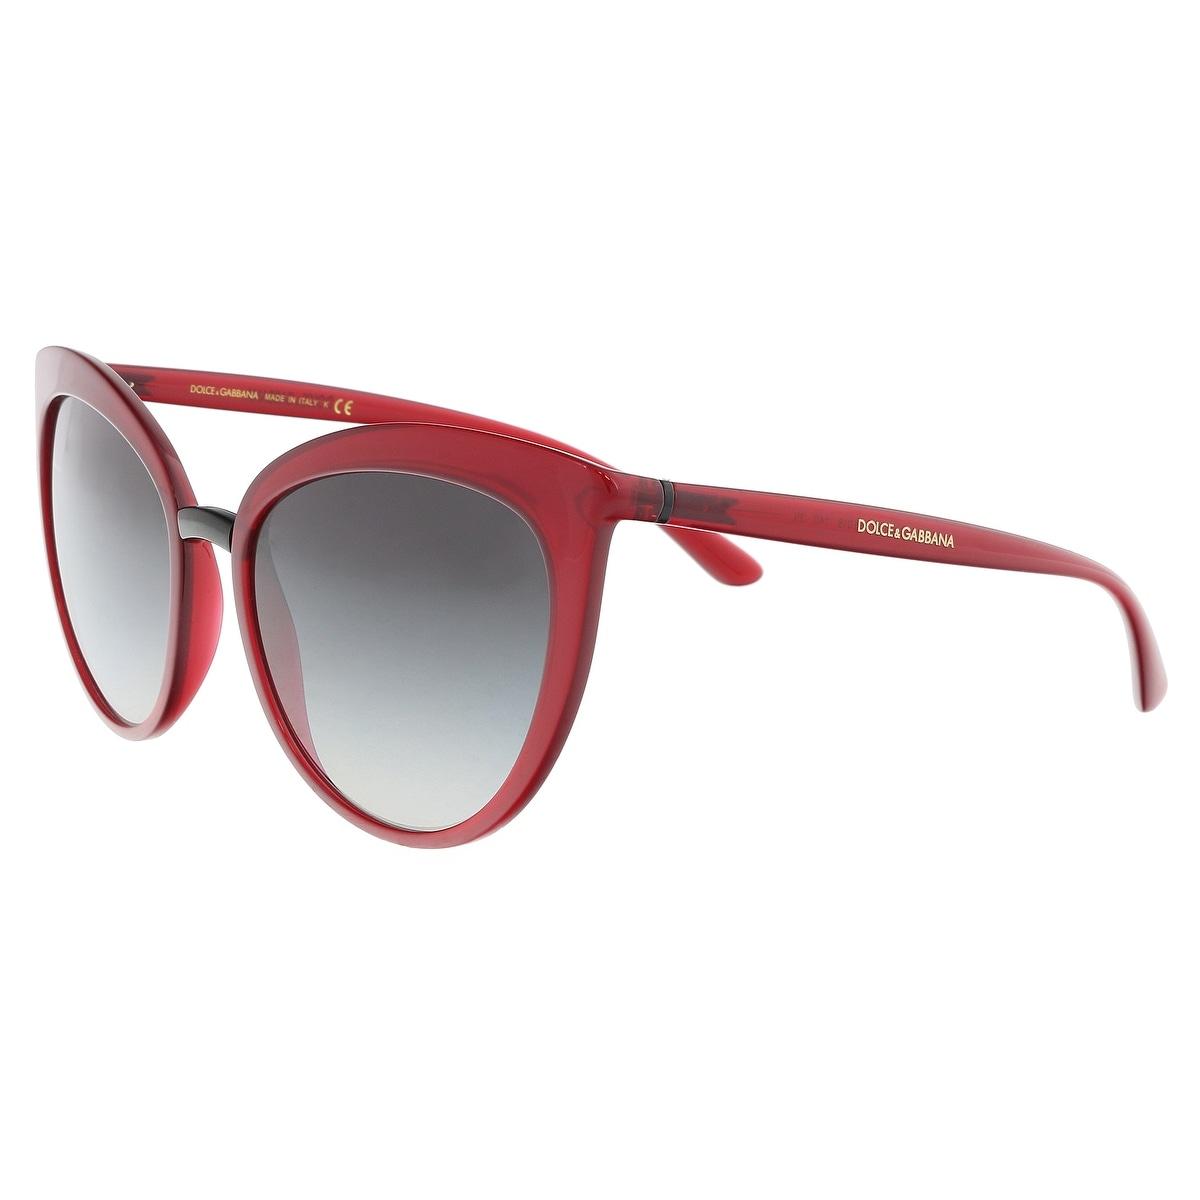 6b5c5563307 Dolce   Gabbana Women s Sunglasses